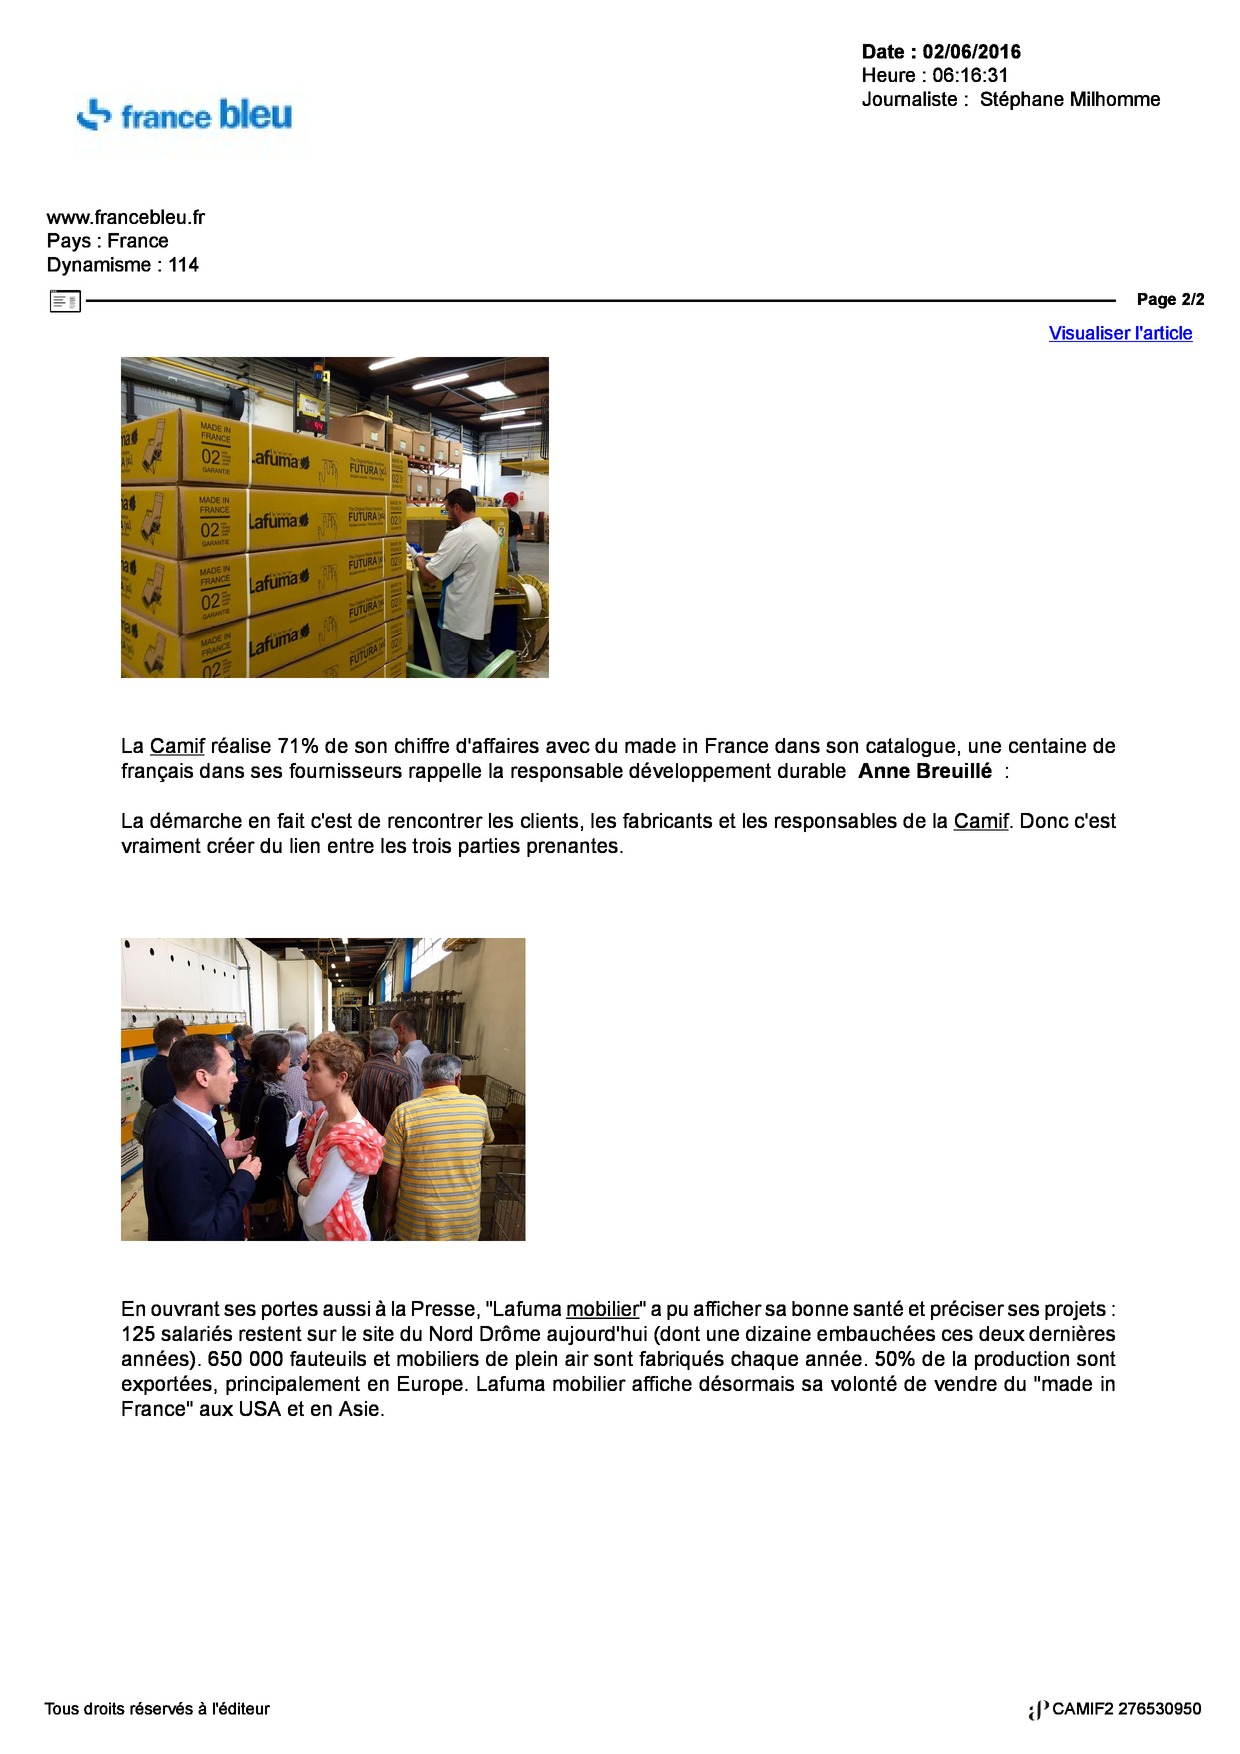 2016-06-025950www_francebleu_fr-page1